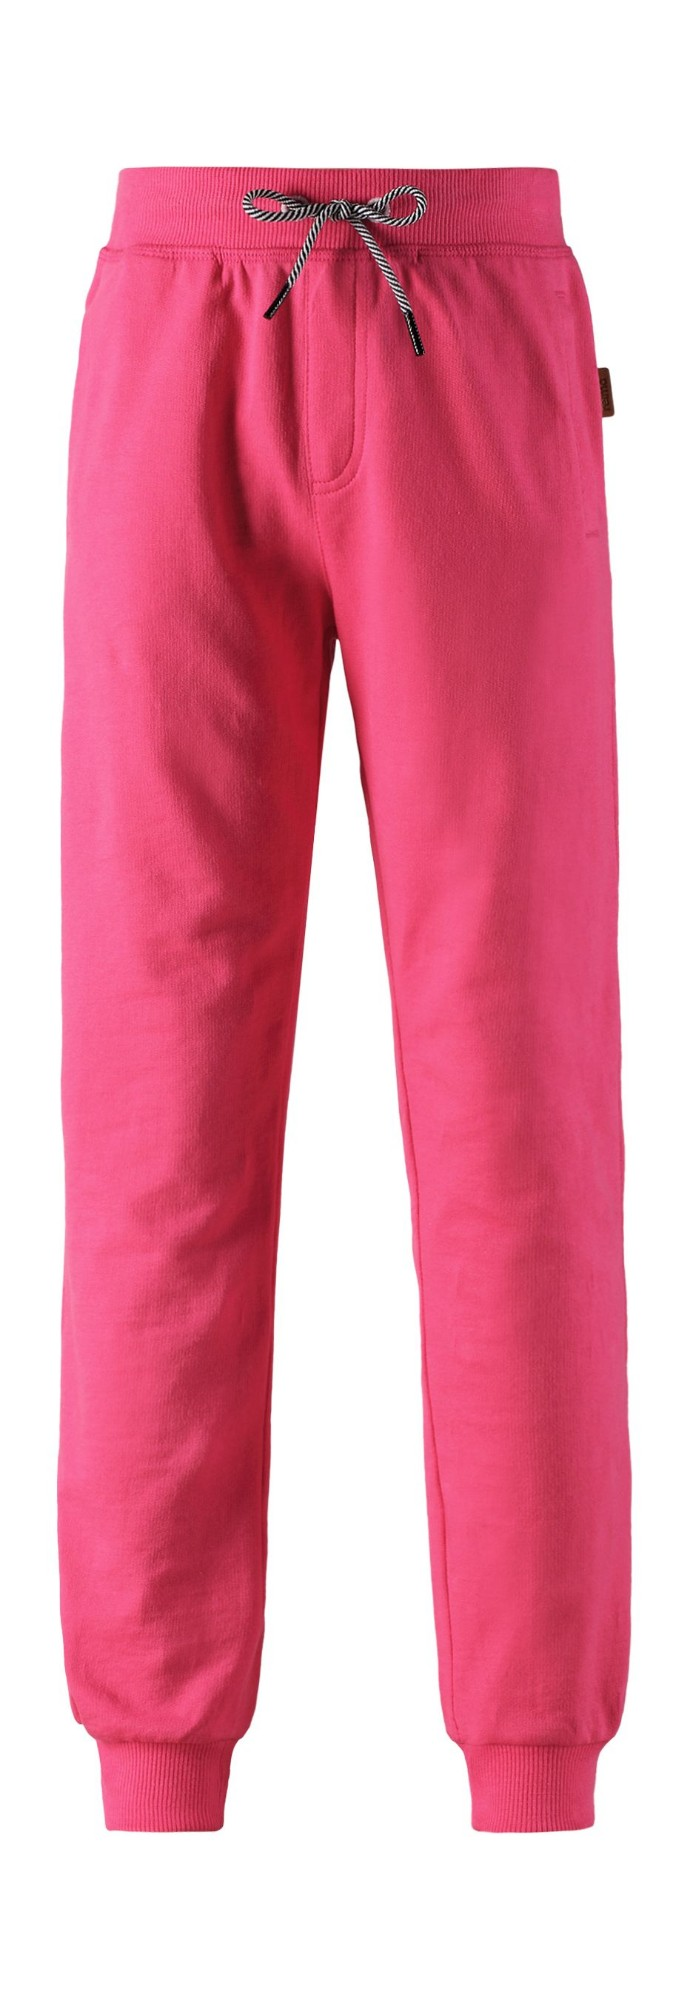 REIMA Suula Candy Pink 128